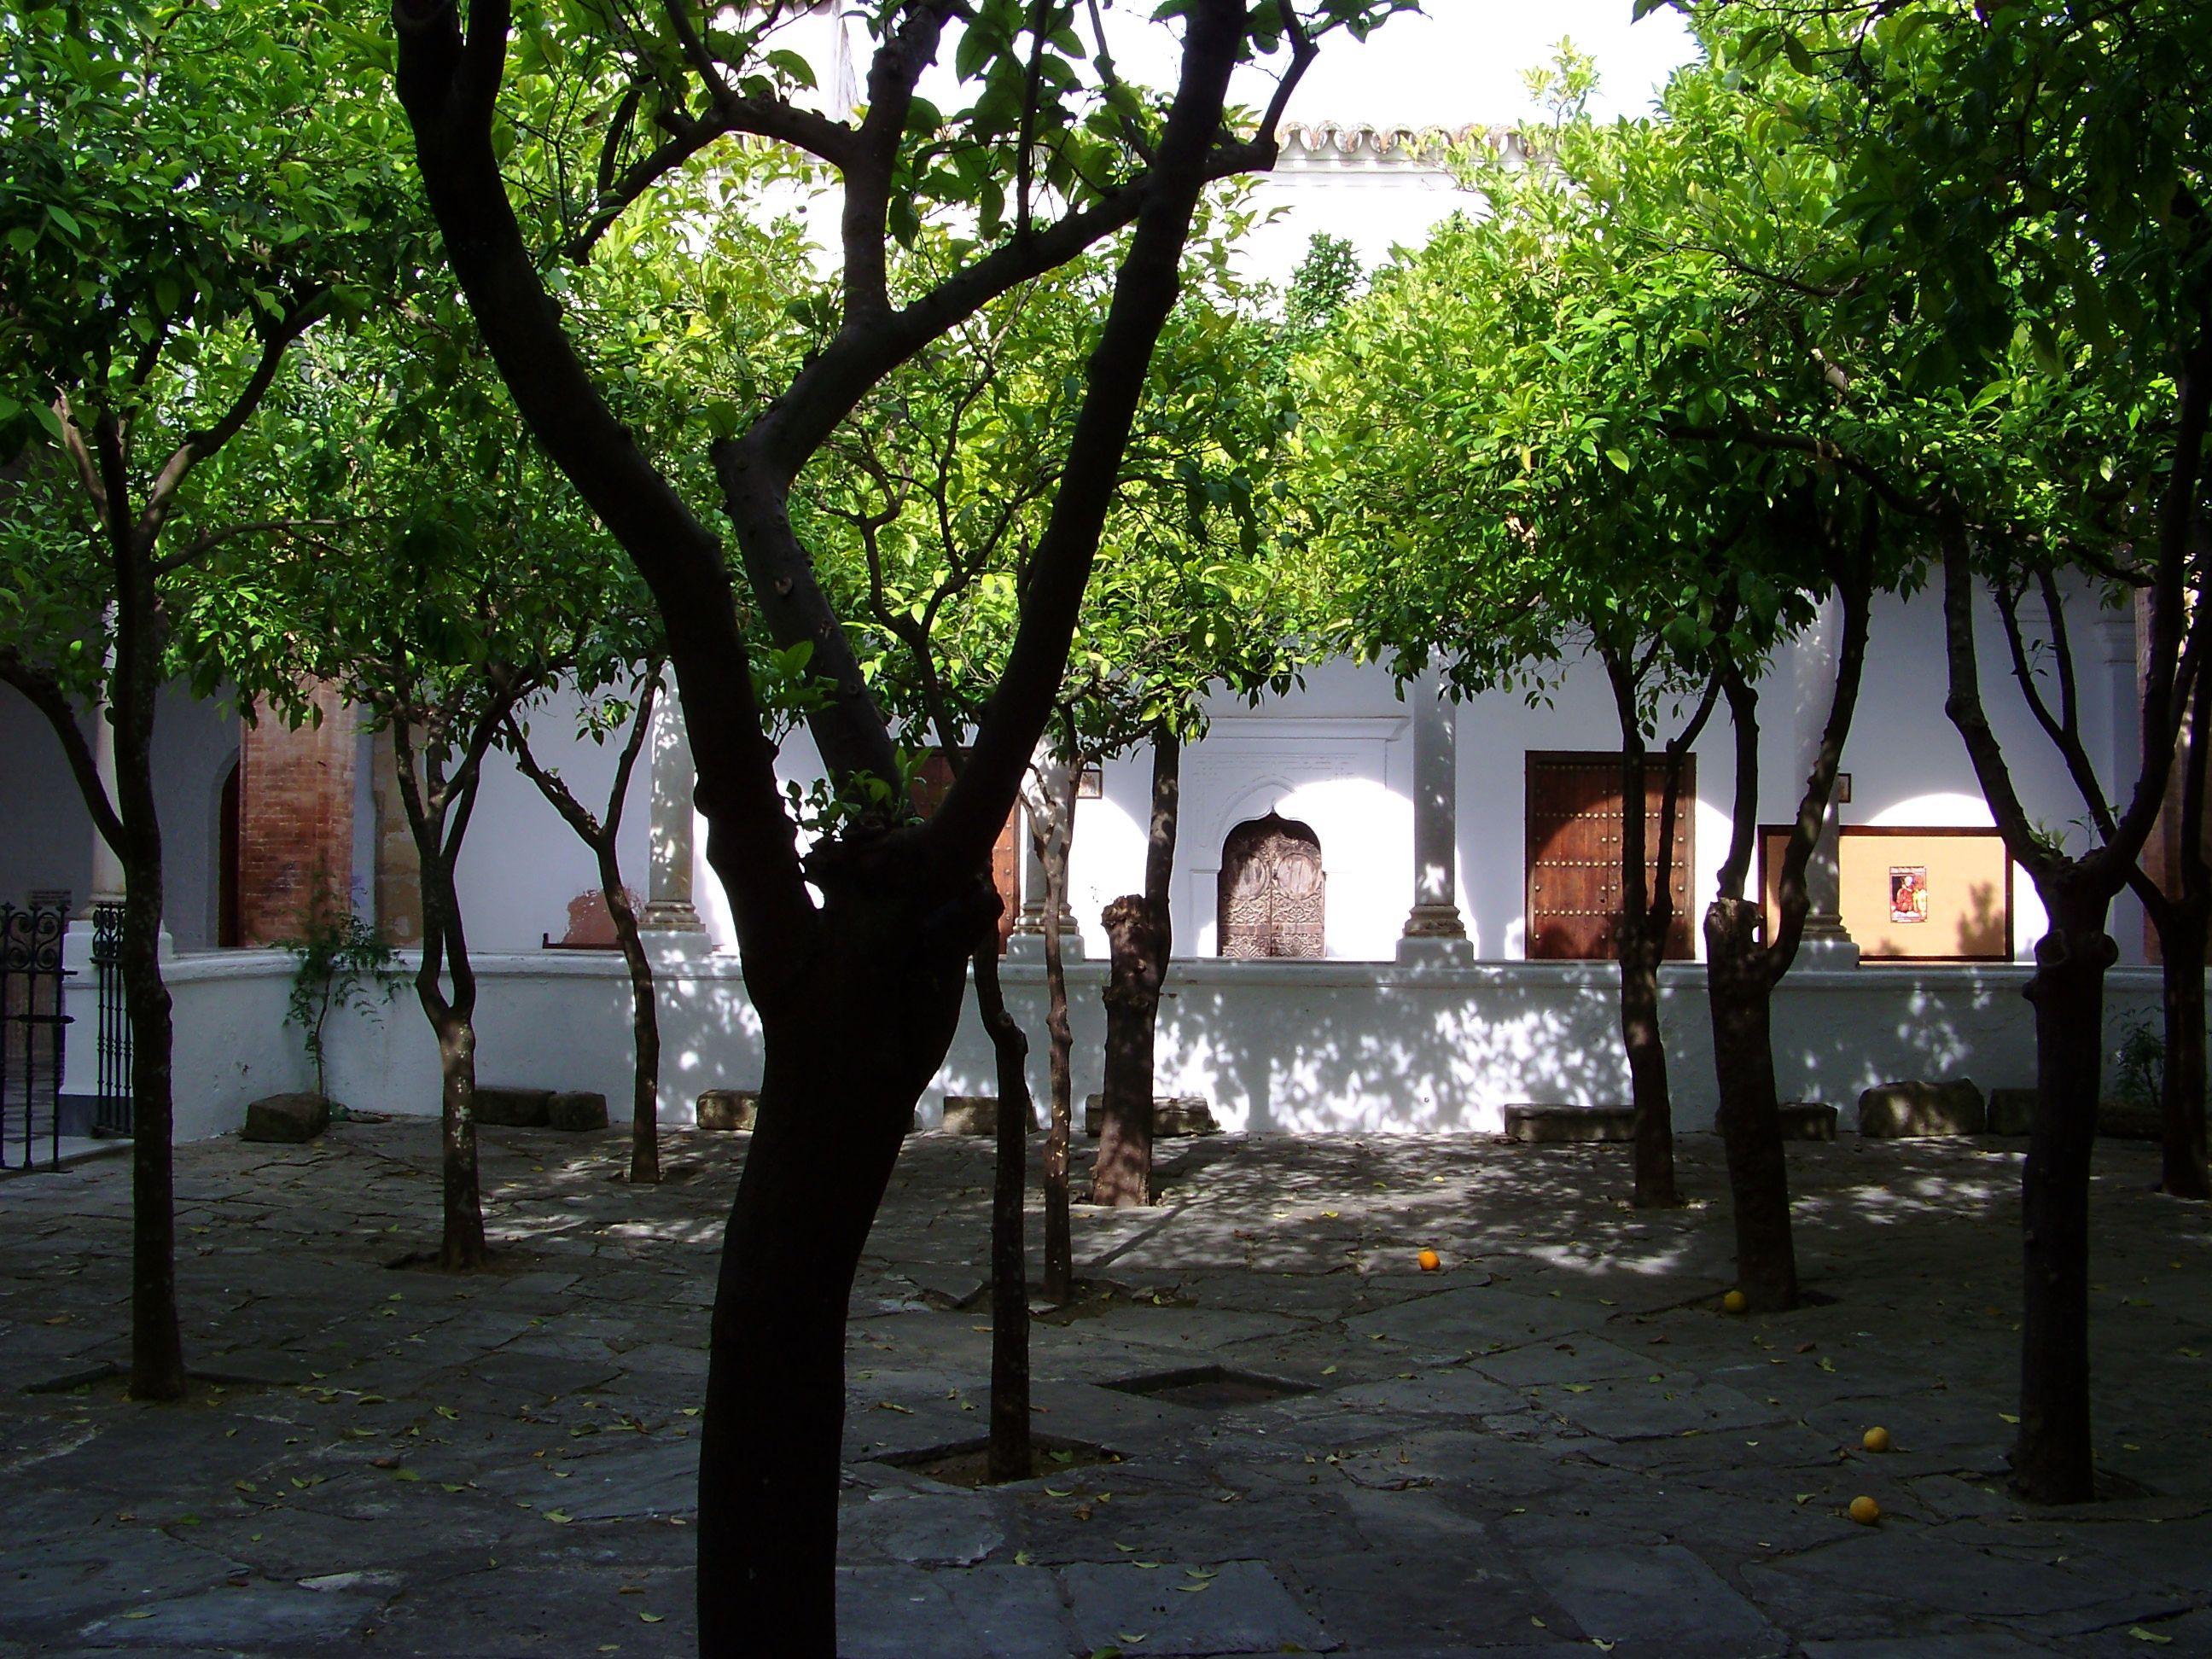 Patio de los Naranjos (Parroquia de la Oliva)